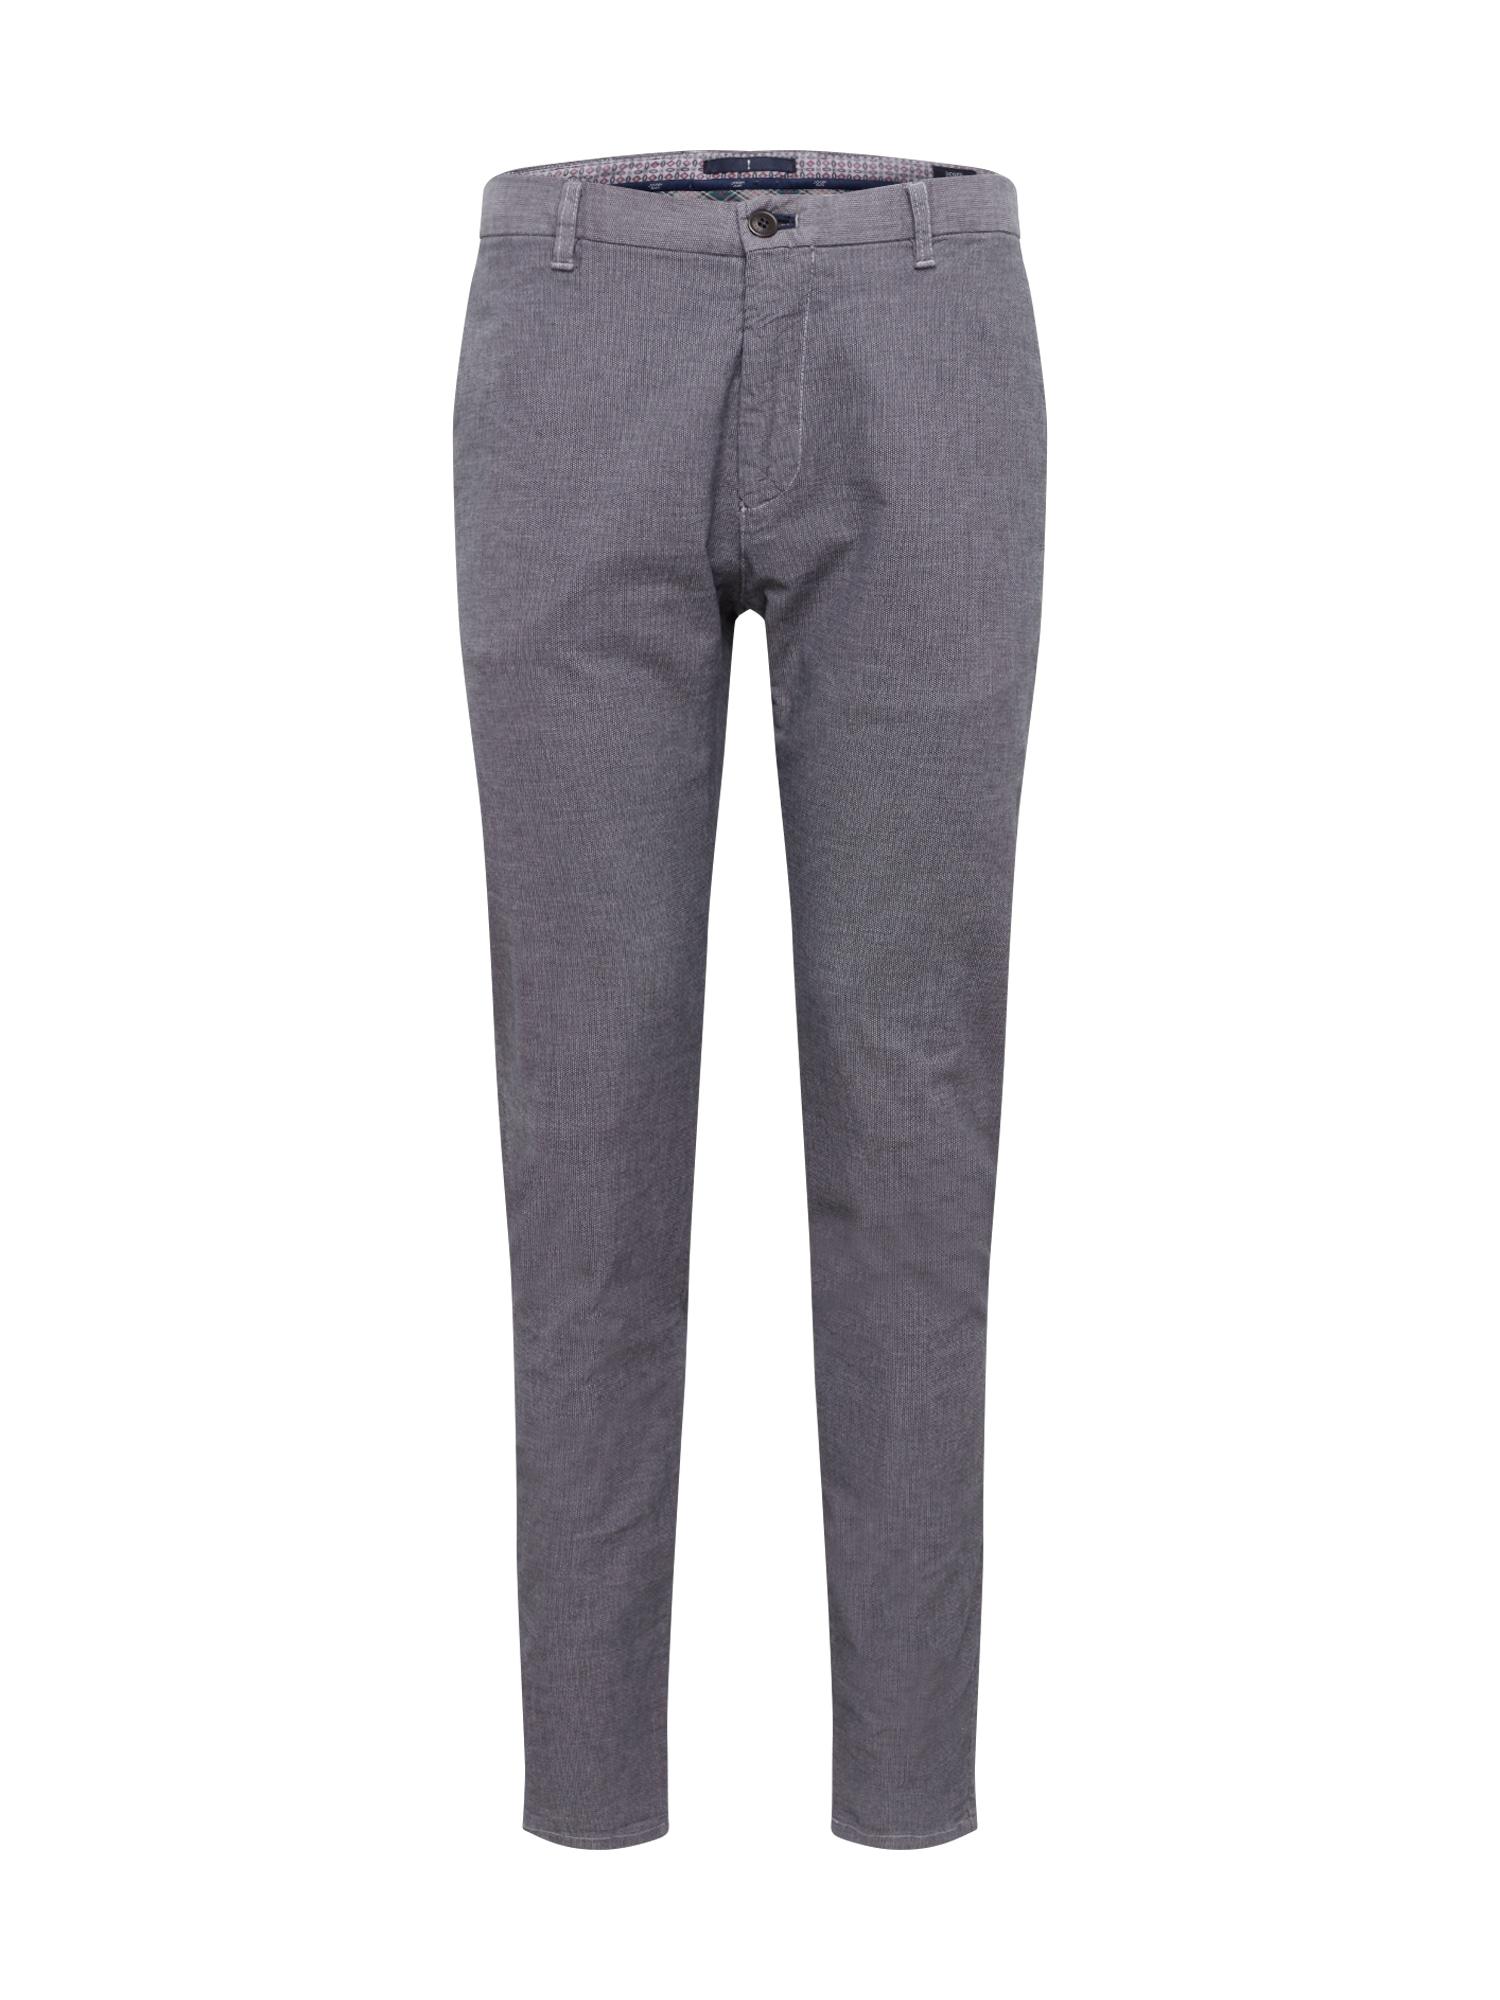 JOOP! Jeans Chino nadrág 'JJF-61Scott-D'  szürke